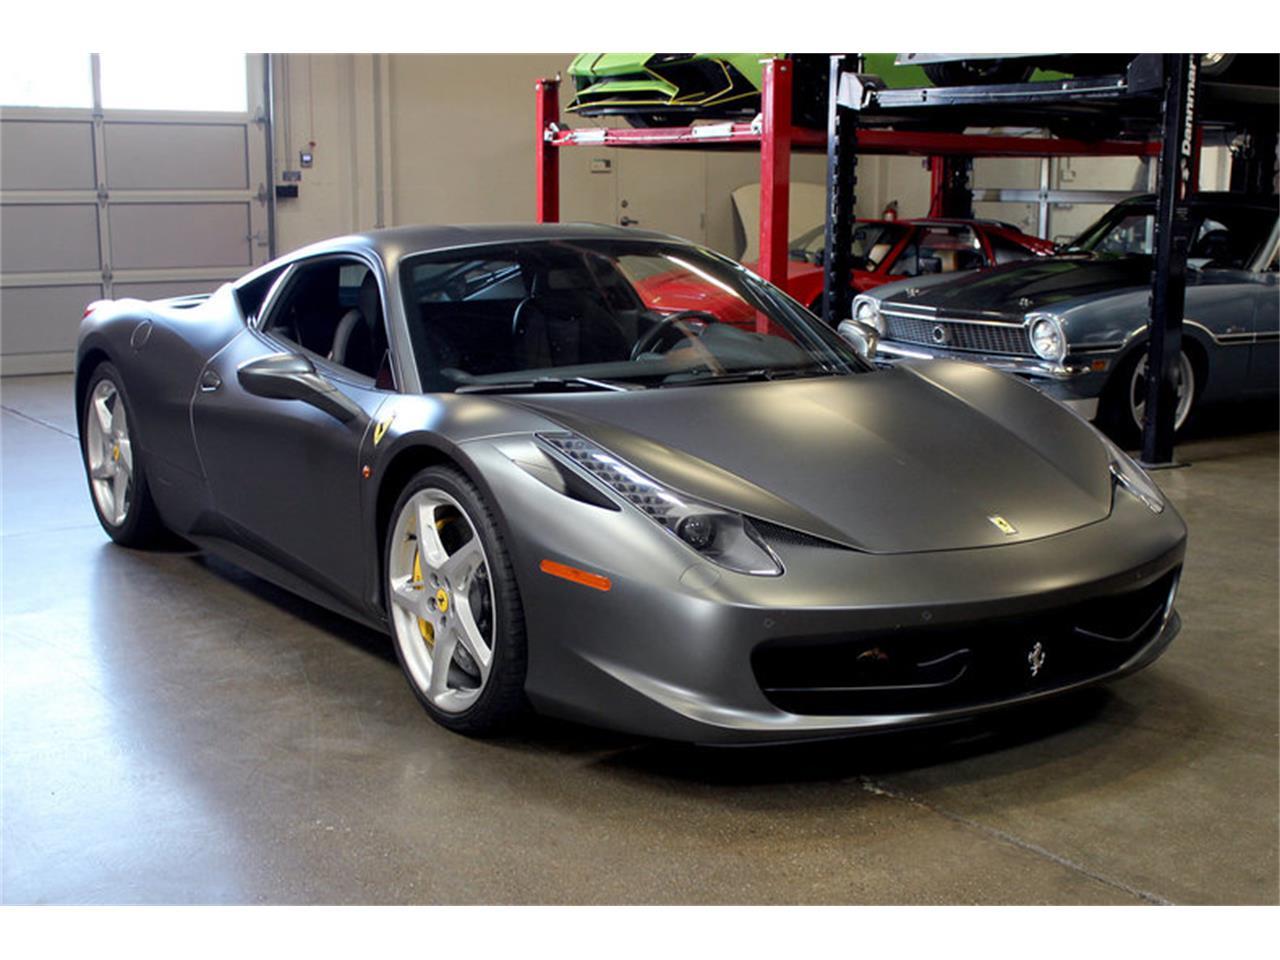 Ferrari 458 Italia For Sale >> For Sale 2013 Ferrari 458 Italia In San Carlos California